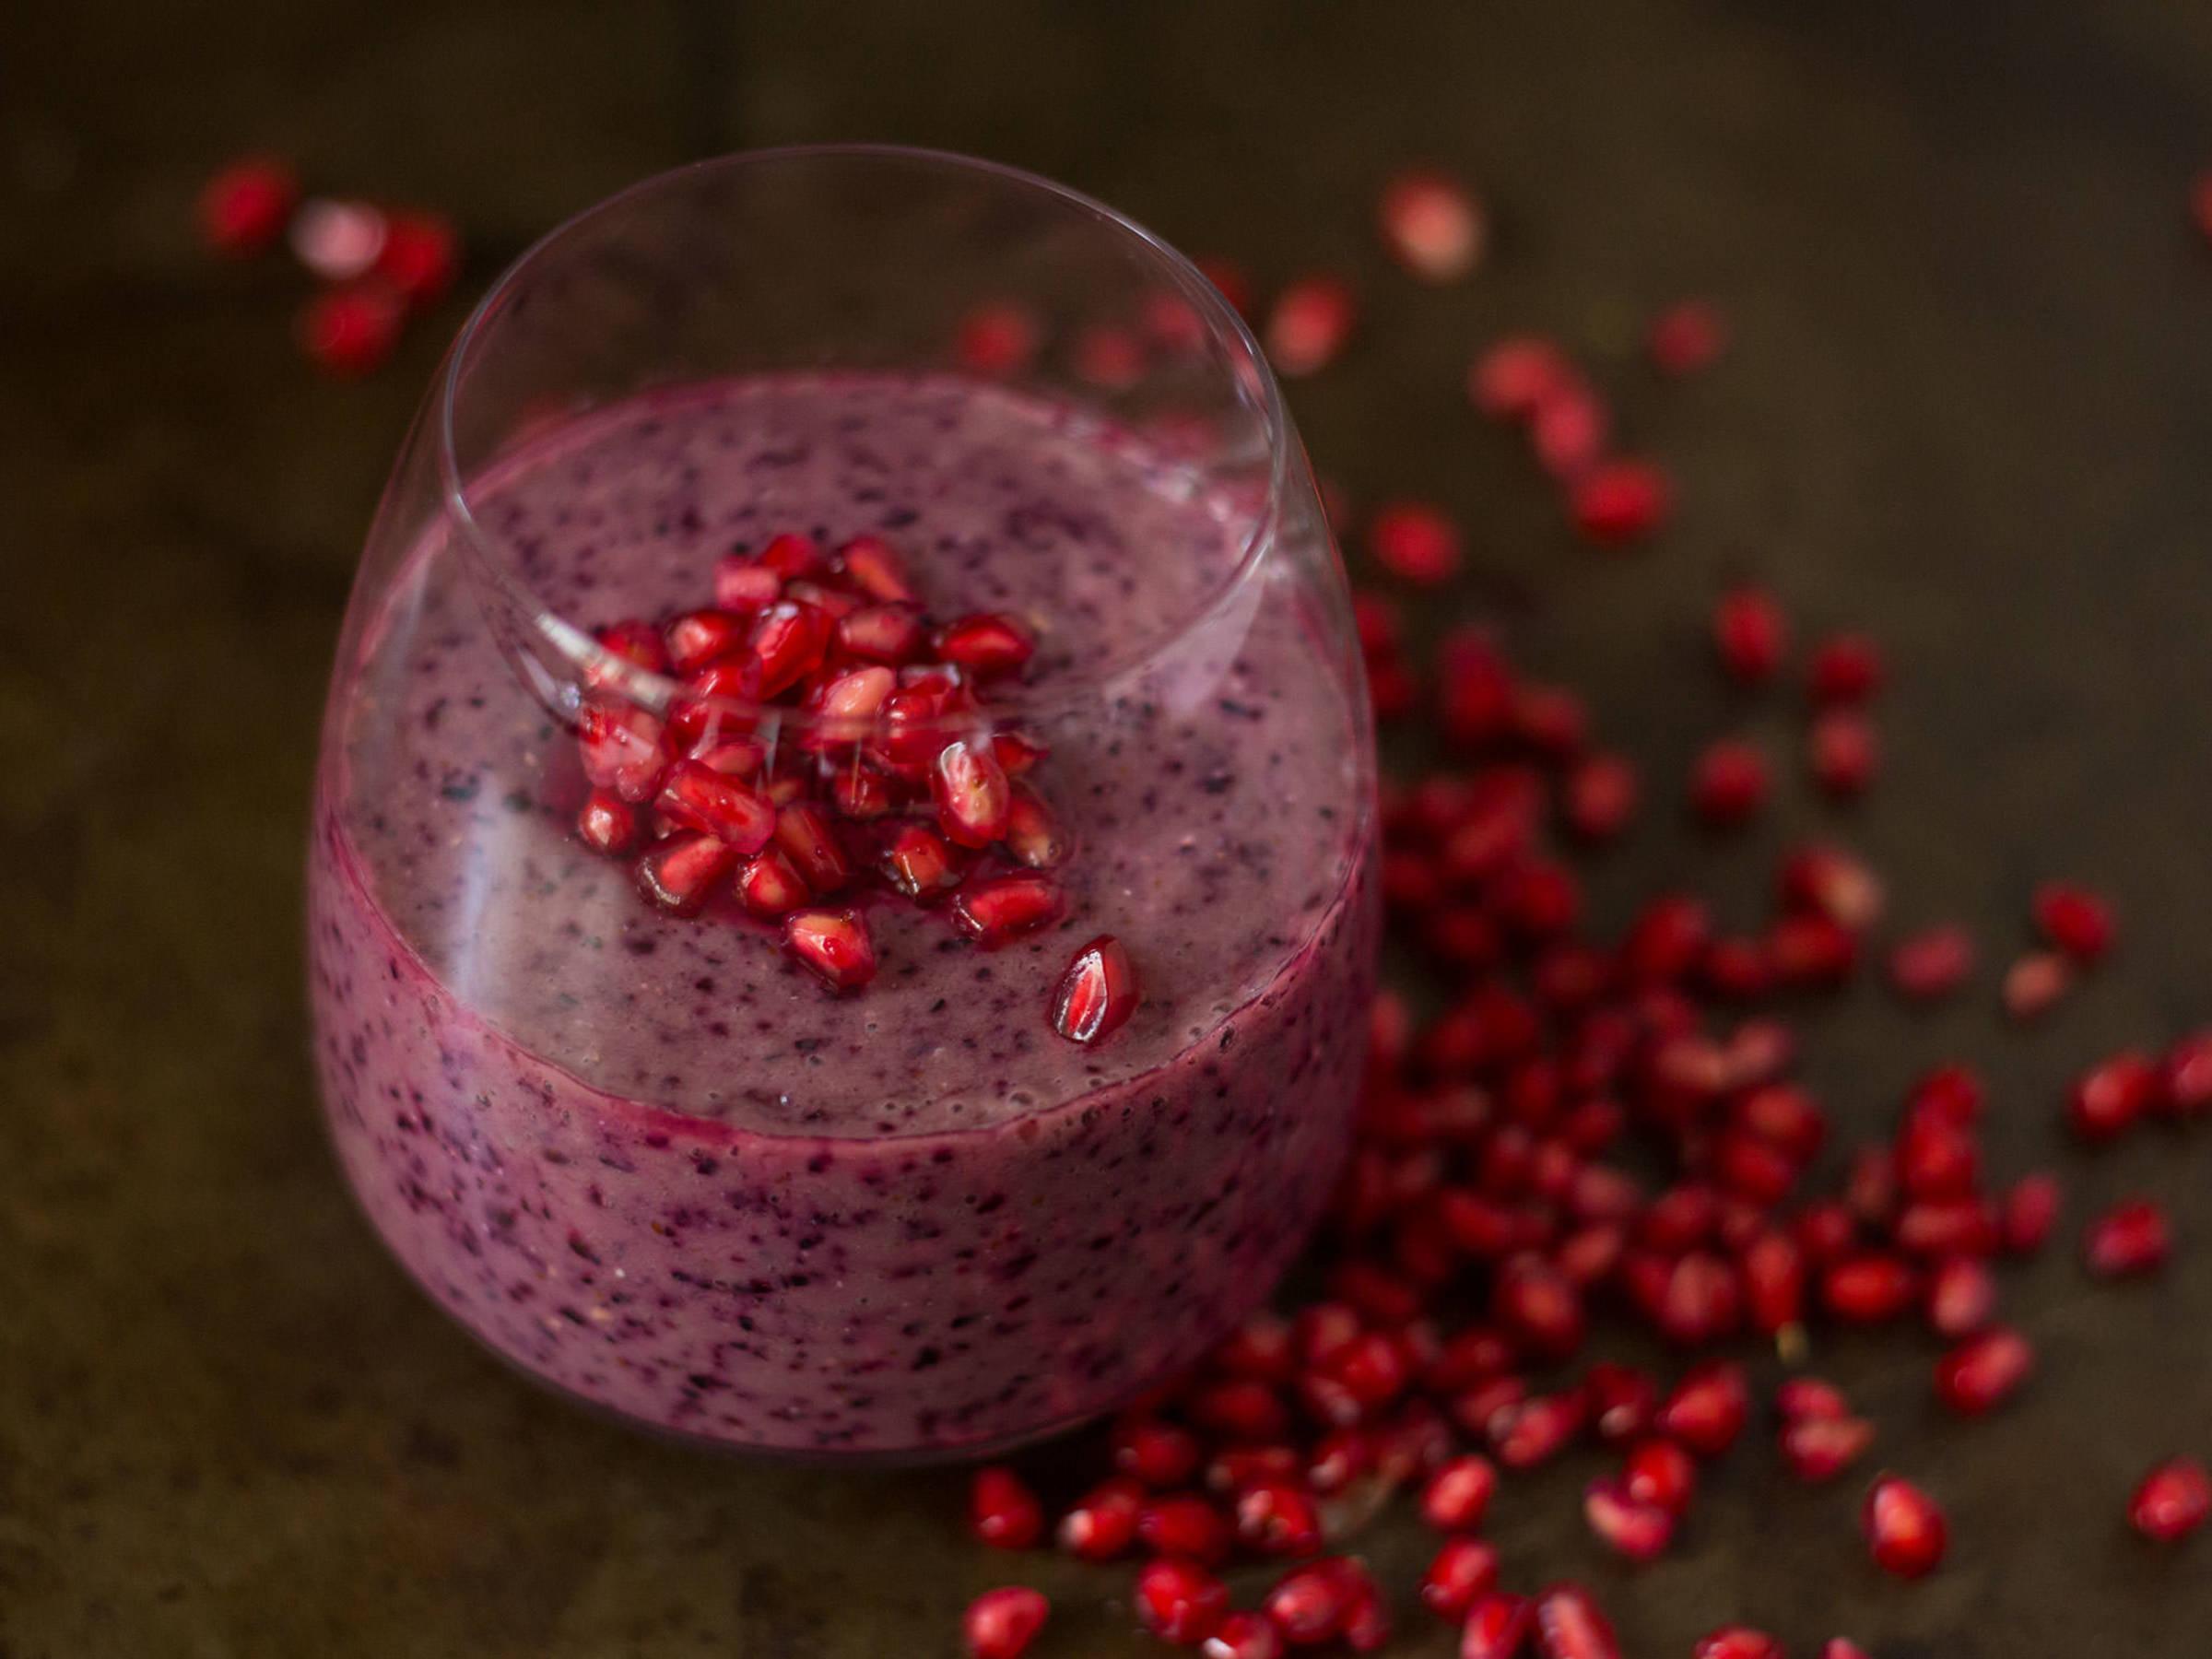 Pomegranate blueberry smoothie